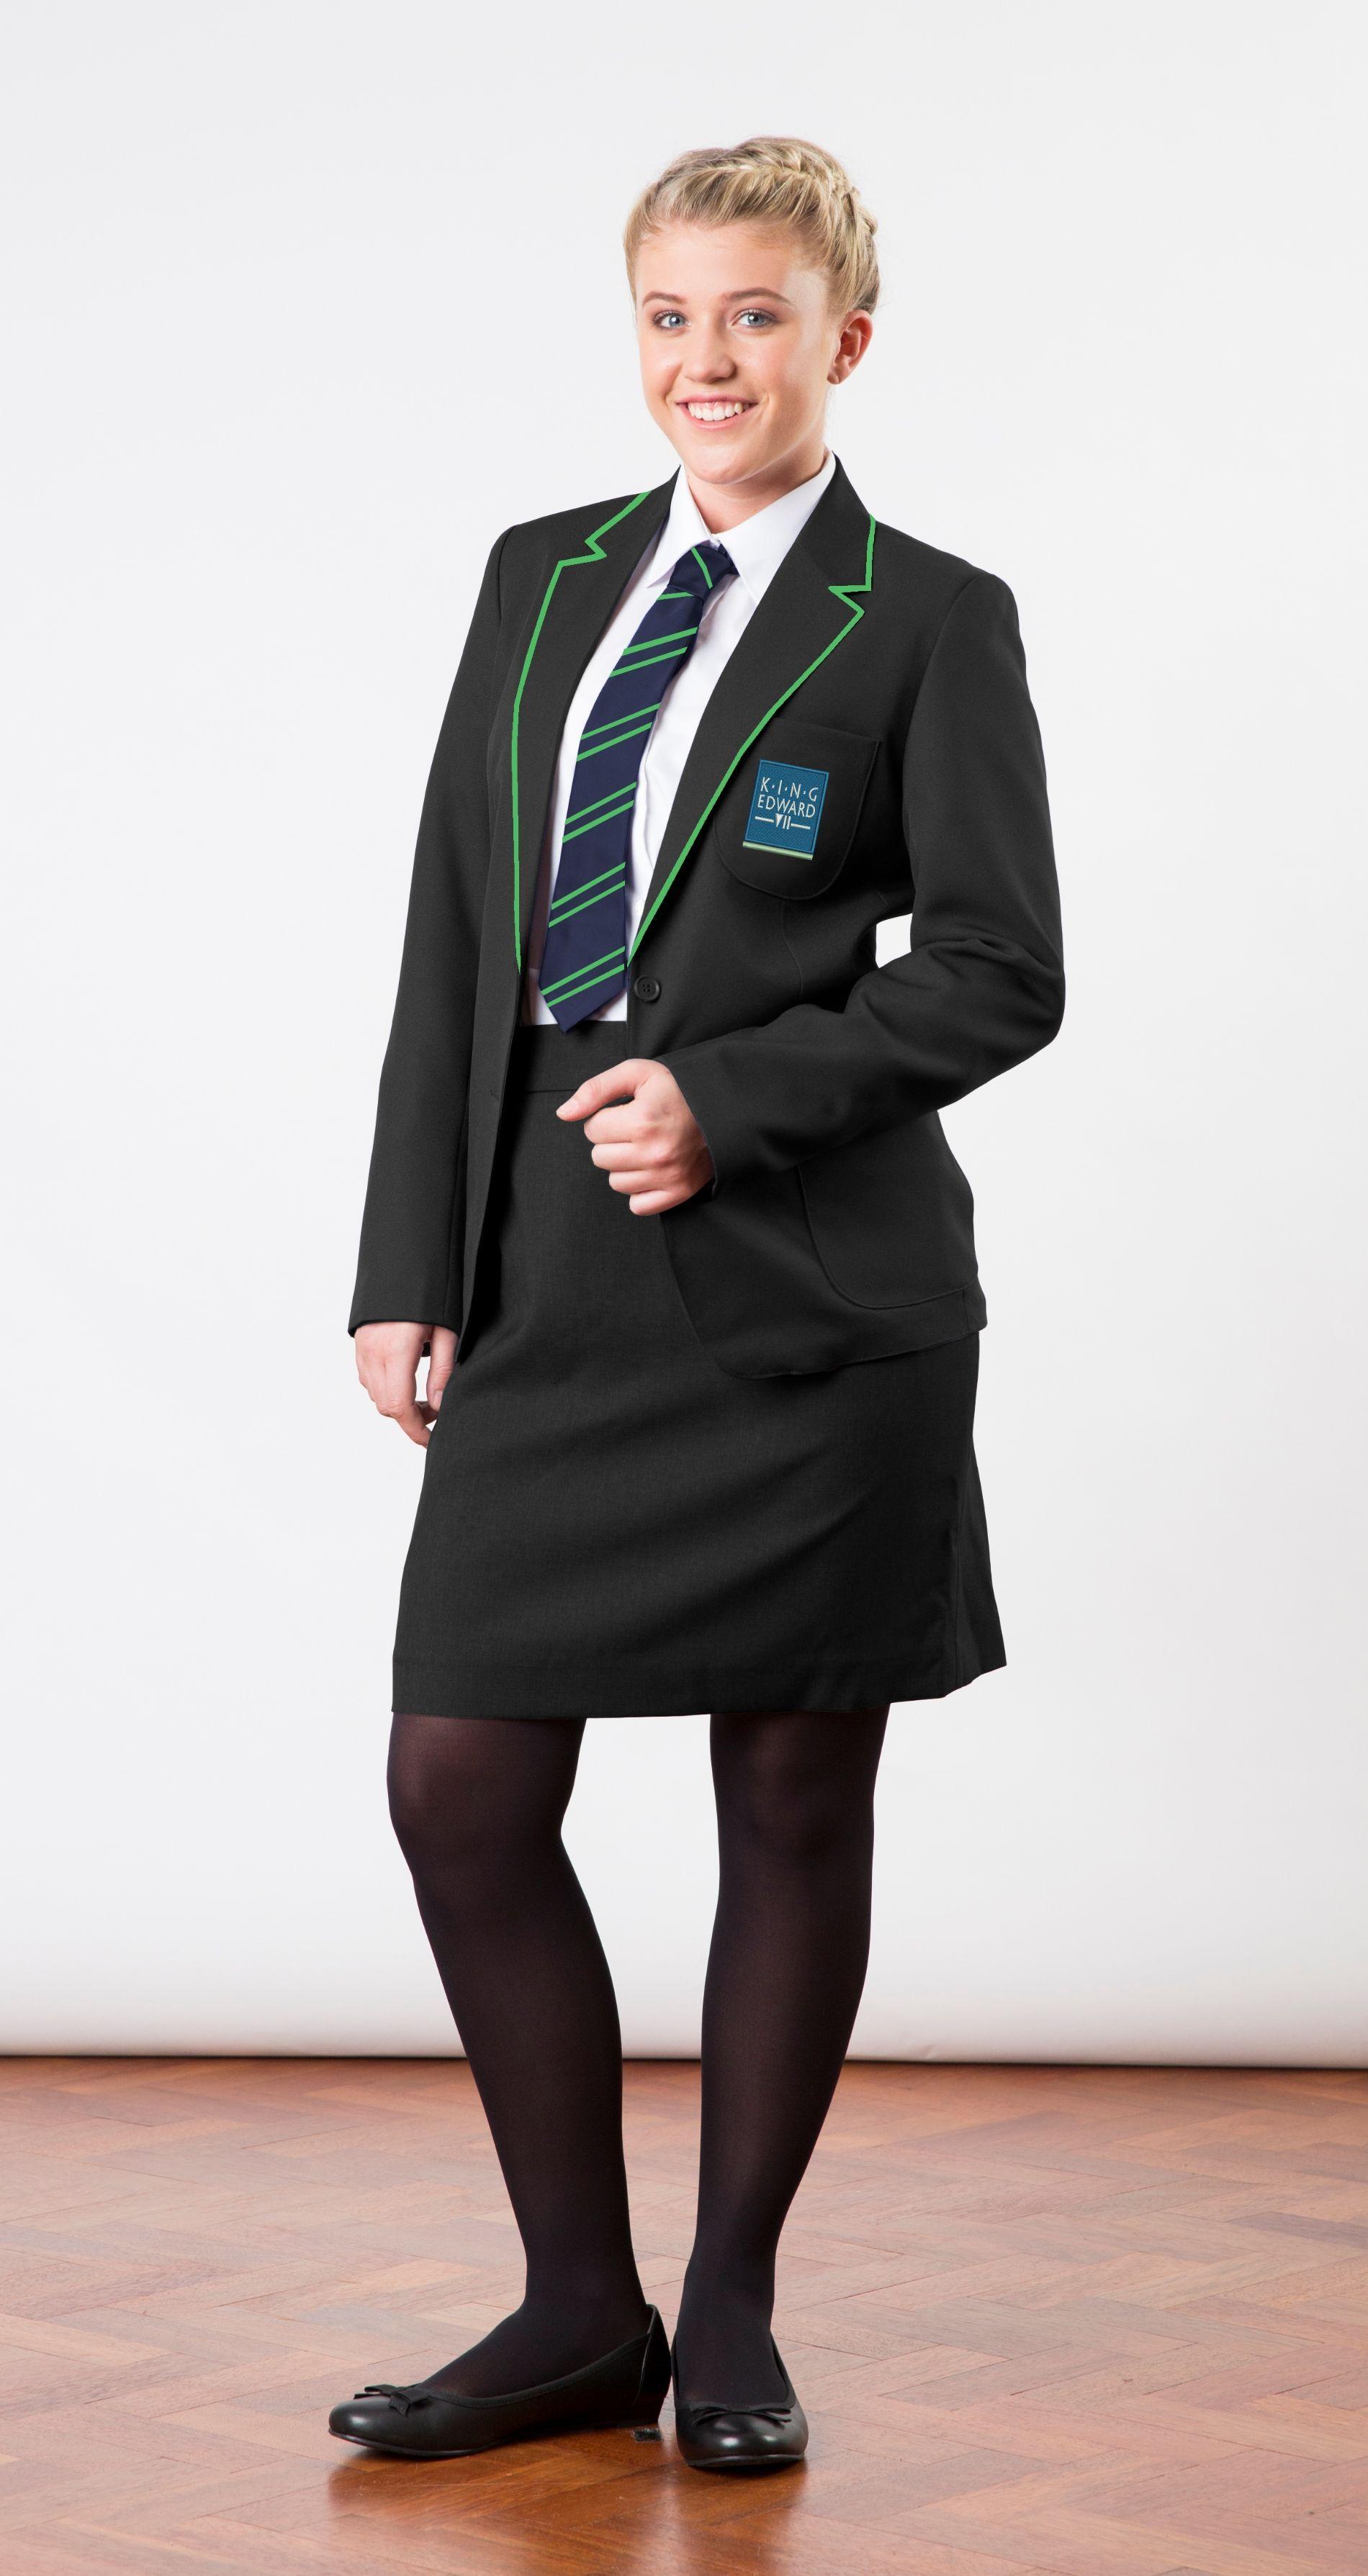 Mollie King In School Uniform - Yahoo Search Results Yahoo -9817